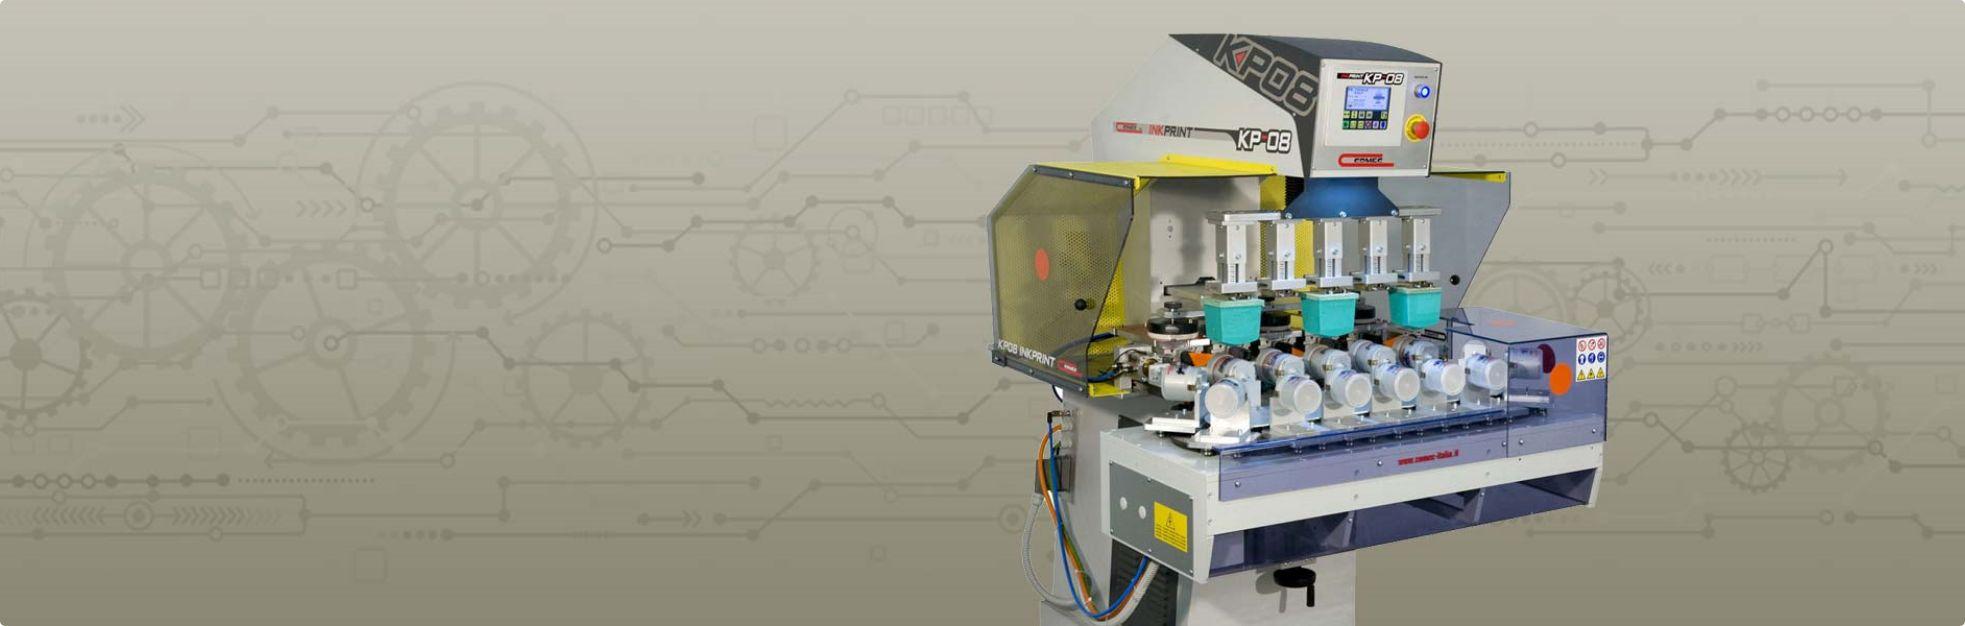 KP08 Pad Printing Machine